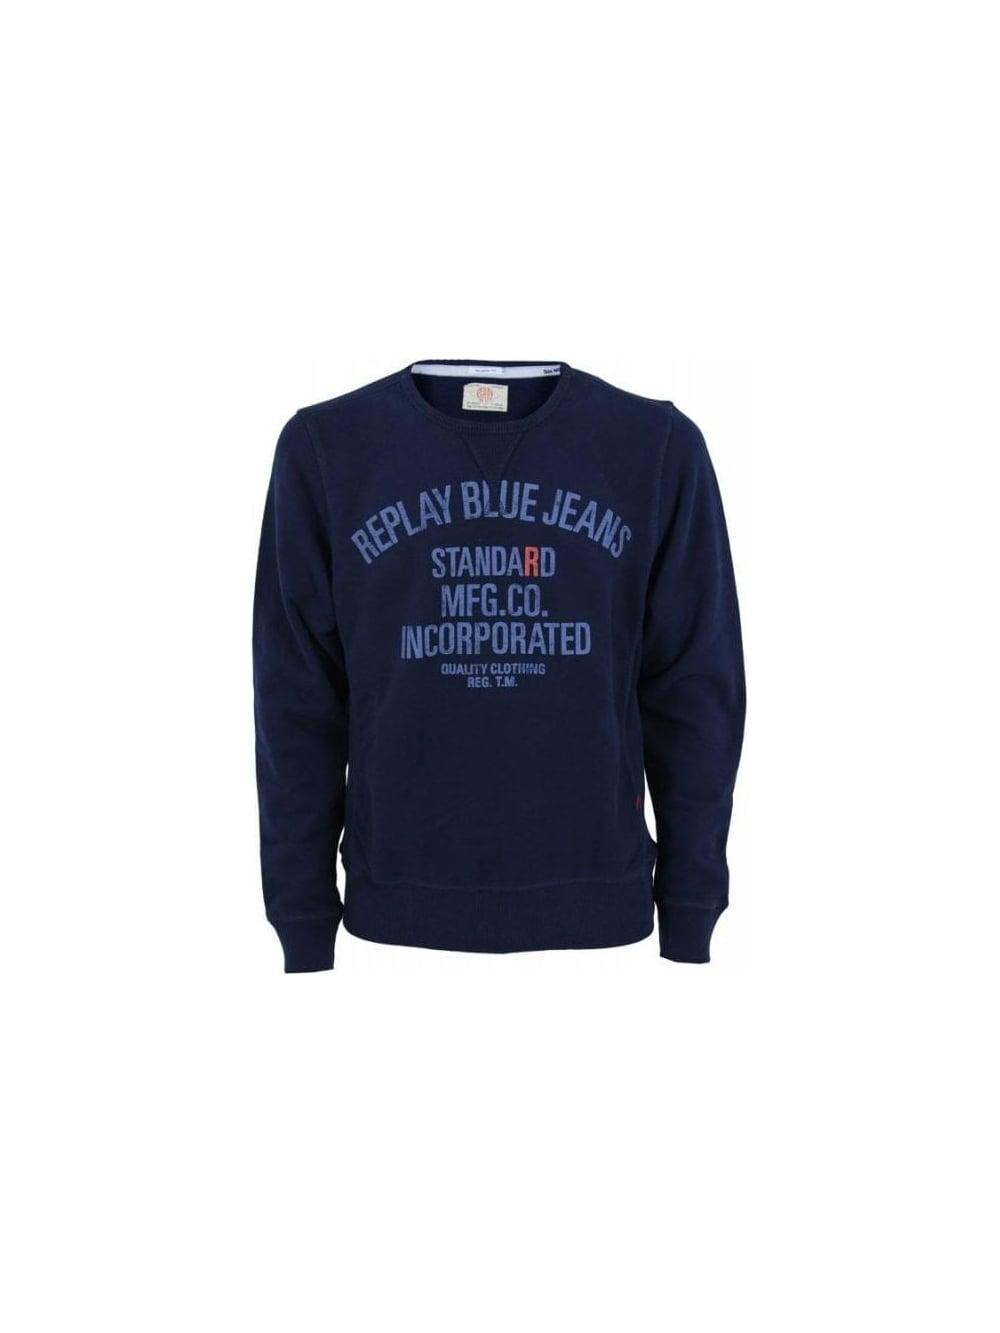 timeless design f784b 7da71 Standard MFG CO Sweatshirt - Navy